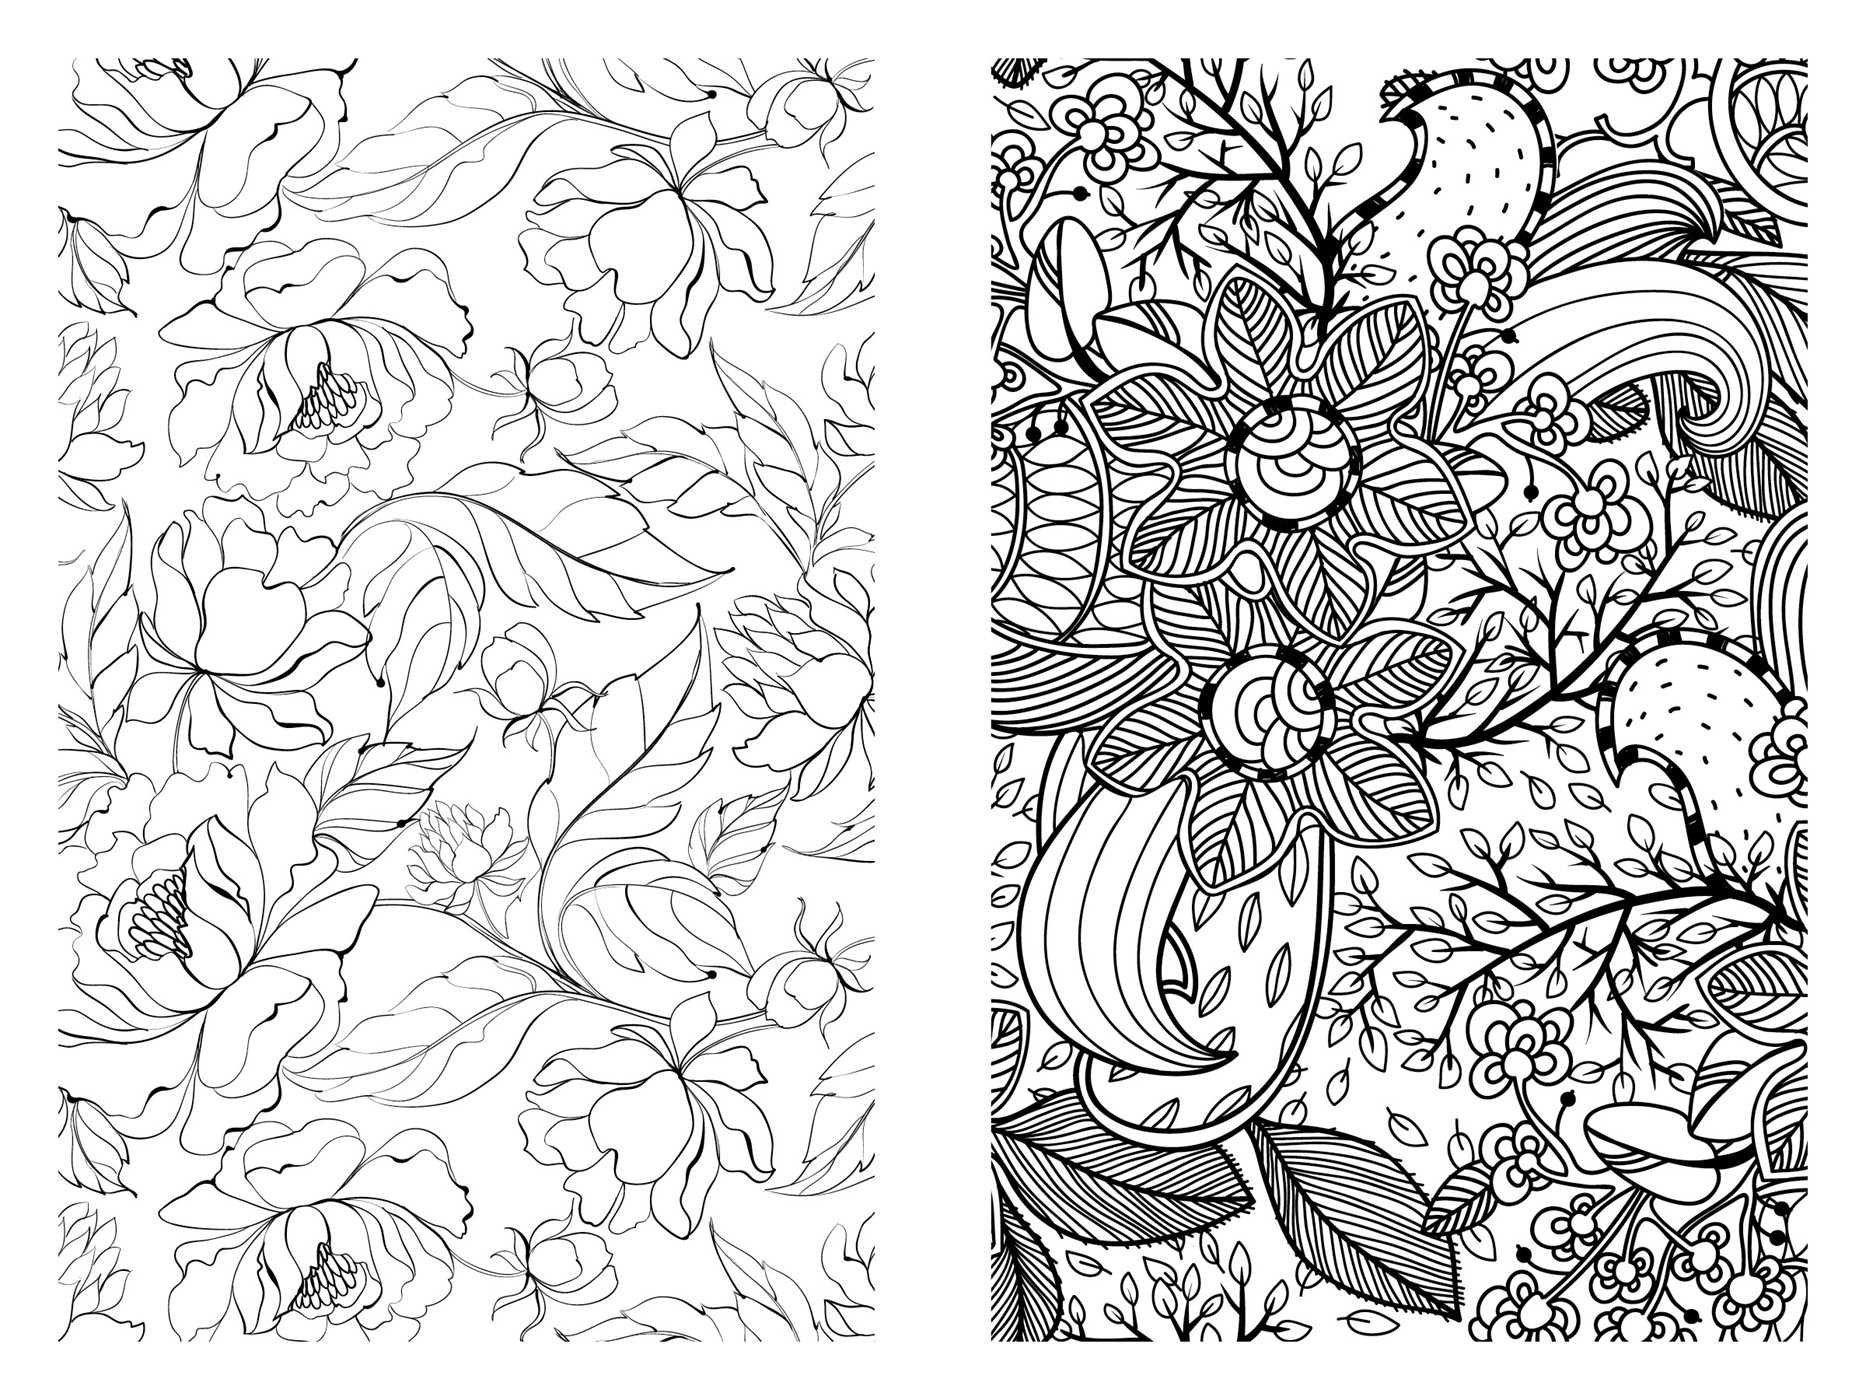 - Amazon.com: Pocket Posh Adult Coloring Book: Pretty Designs For